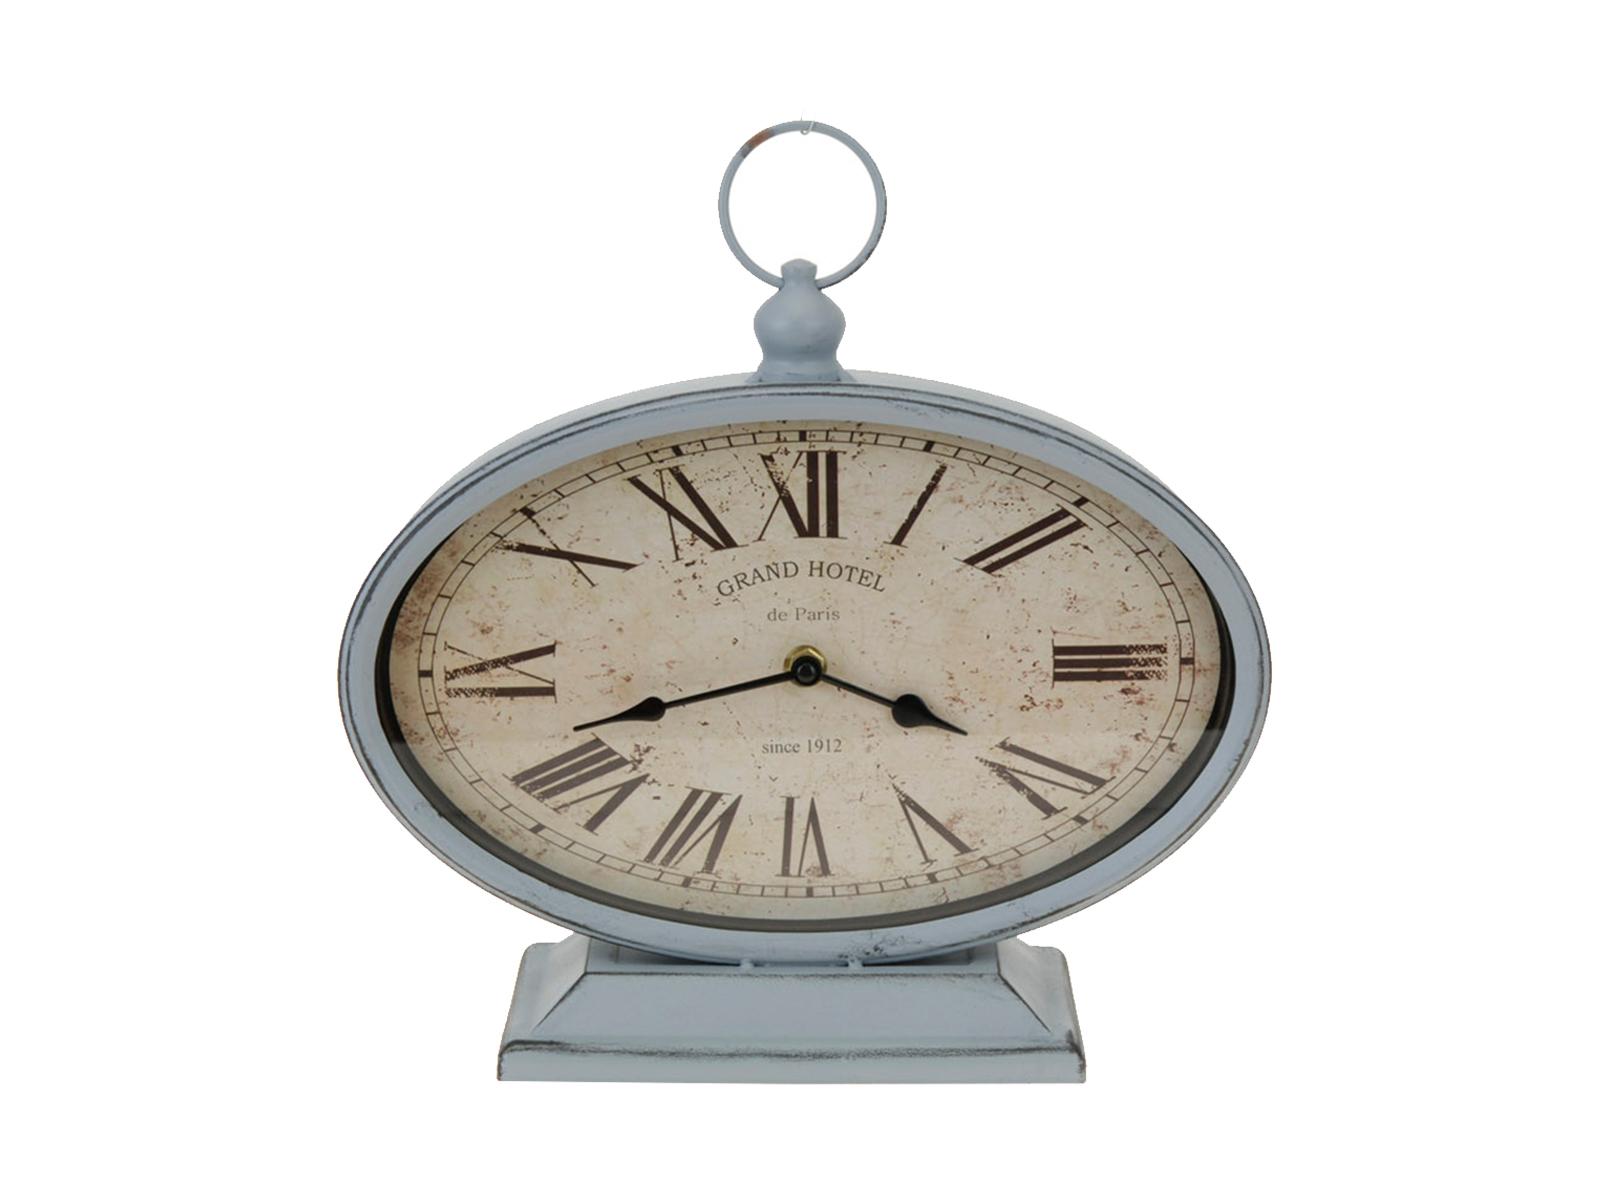 Часы GrandНастольные часы<br>Декоративные настольные часы&amp;lt;div&amp;gt;&amp;lt;br&amp;gt;&amp;lt;/div&amp;gt;&amp;lt;div&amp;gt;Кварцевый механиз&amp;lt;/div&amp;gt;<br><br>Material: Металл<br>Ширина см: 29<br>Высота см: 25<br>Глубина см: 10